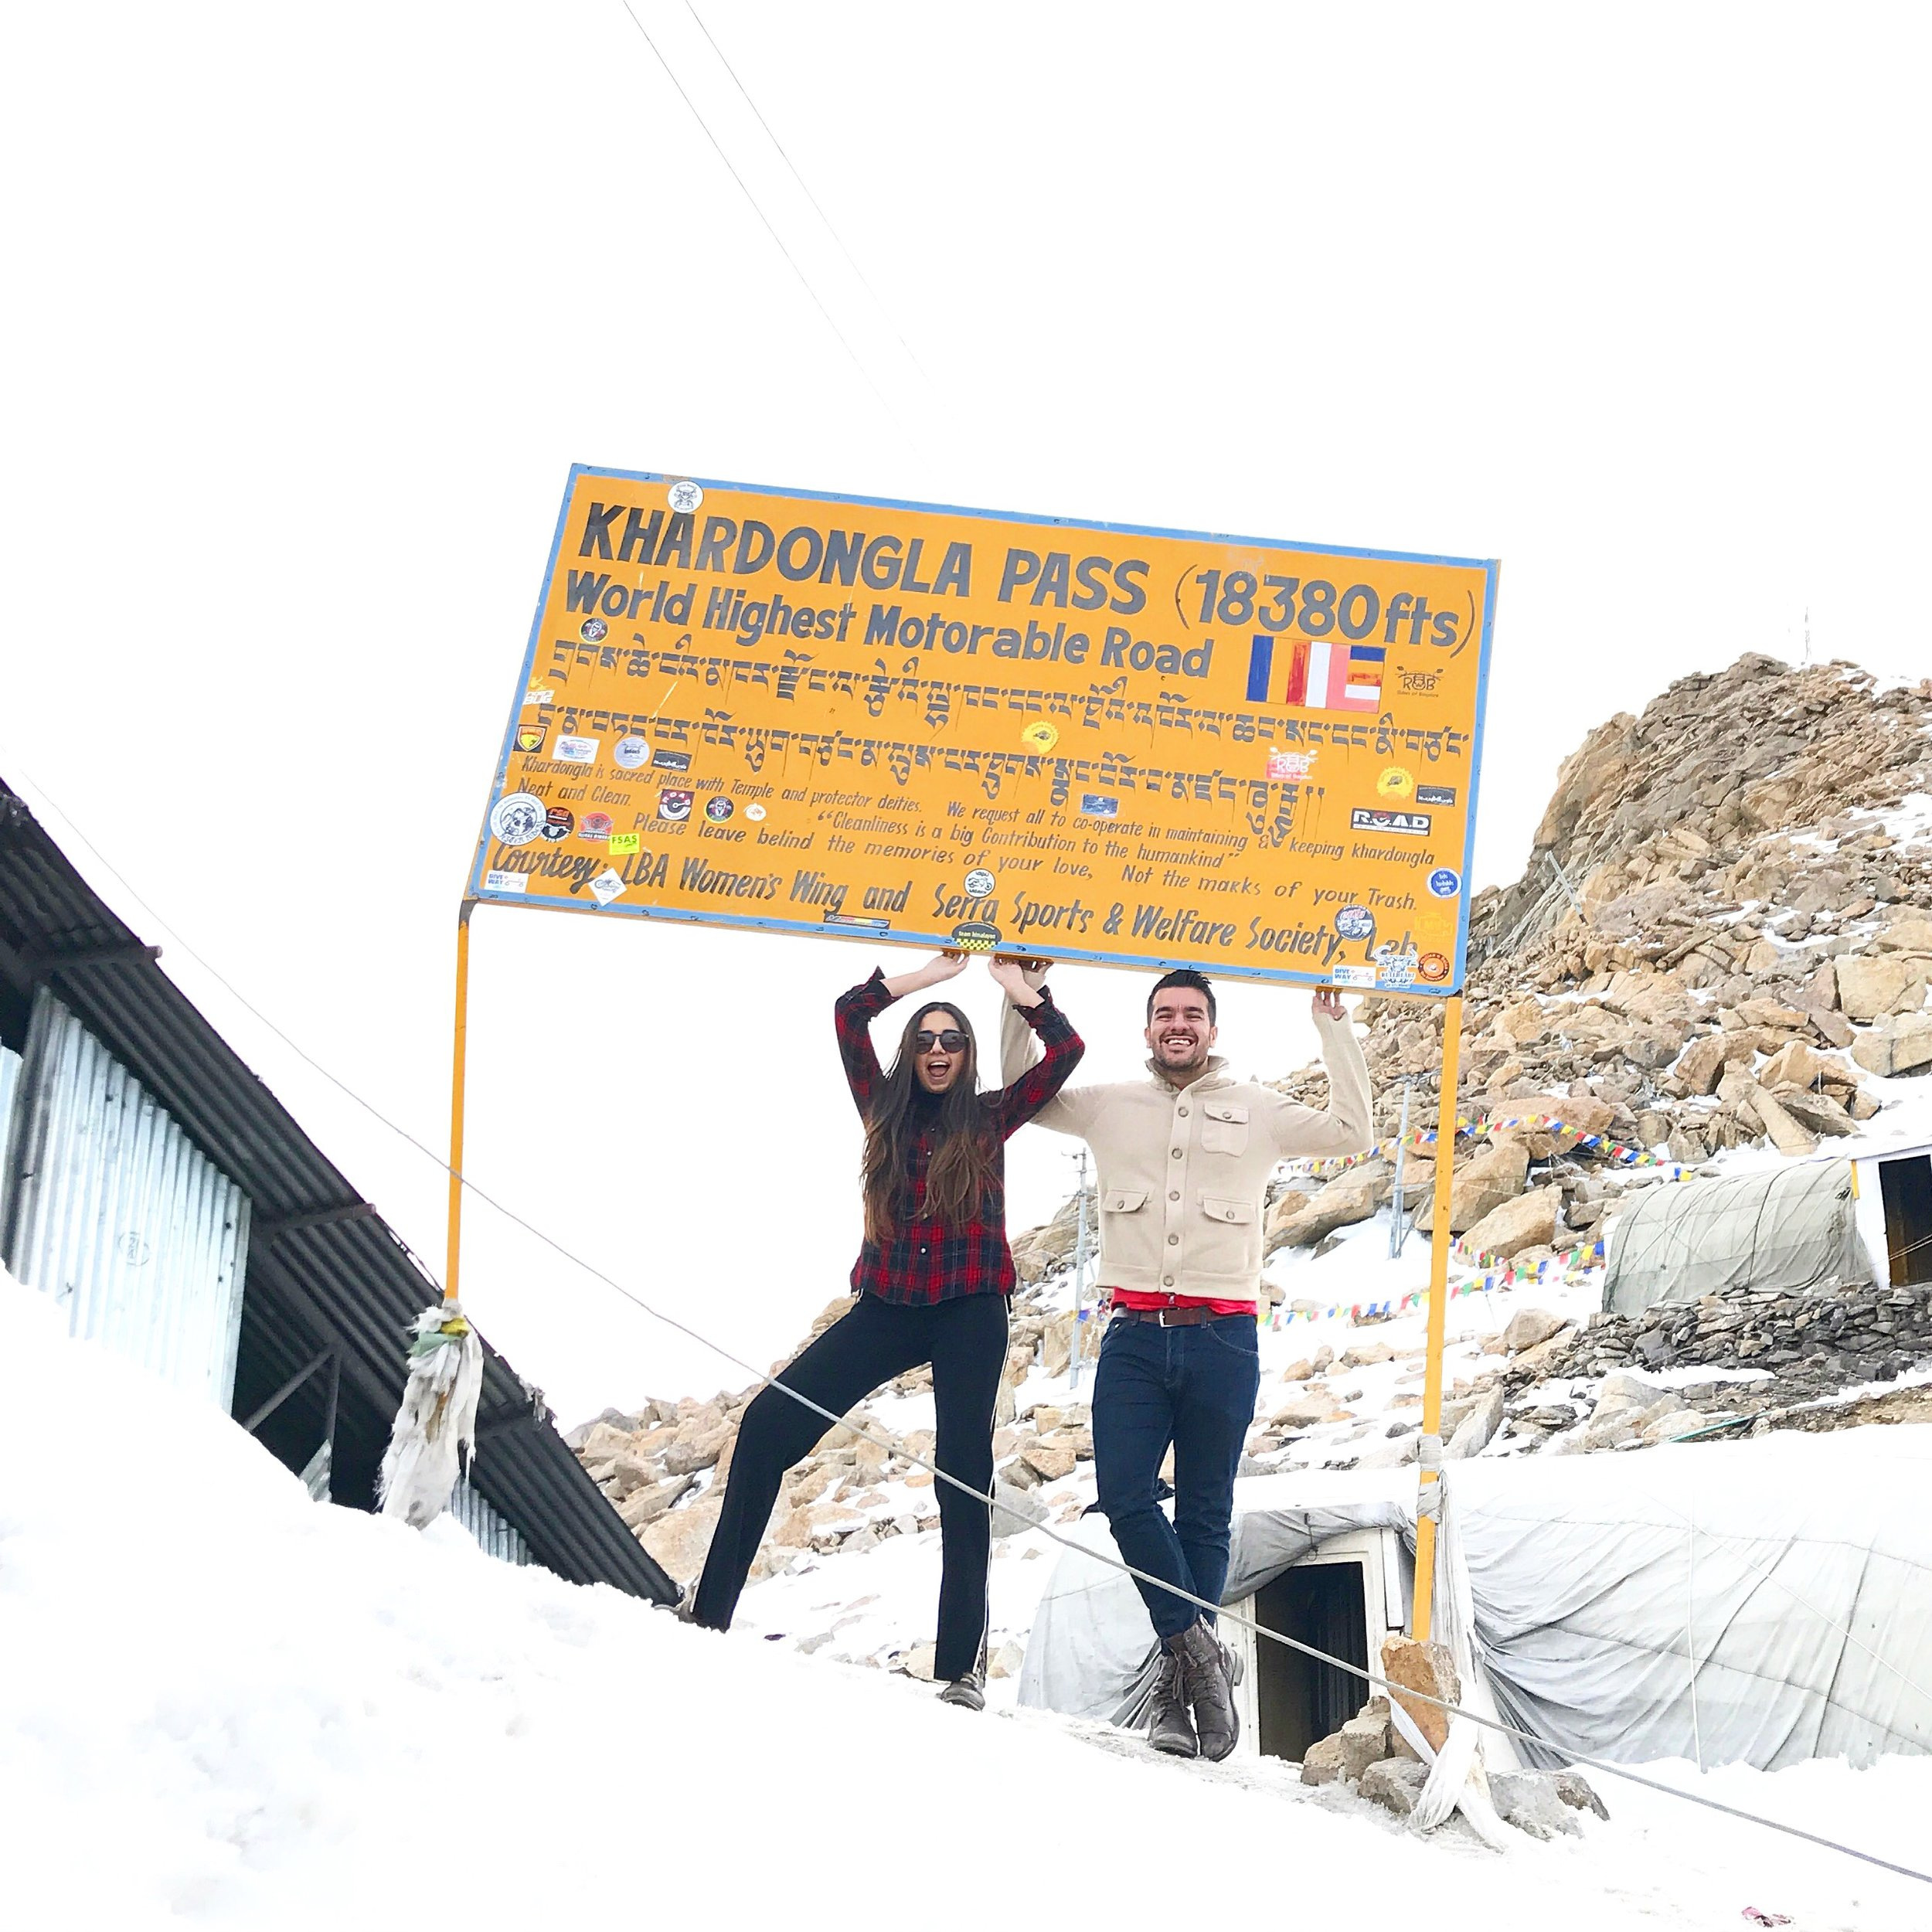 Khardongla pass (India)